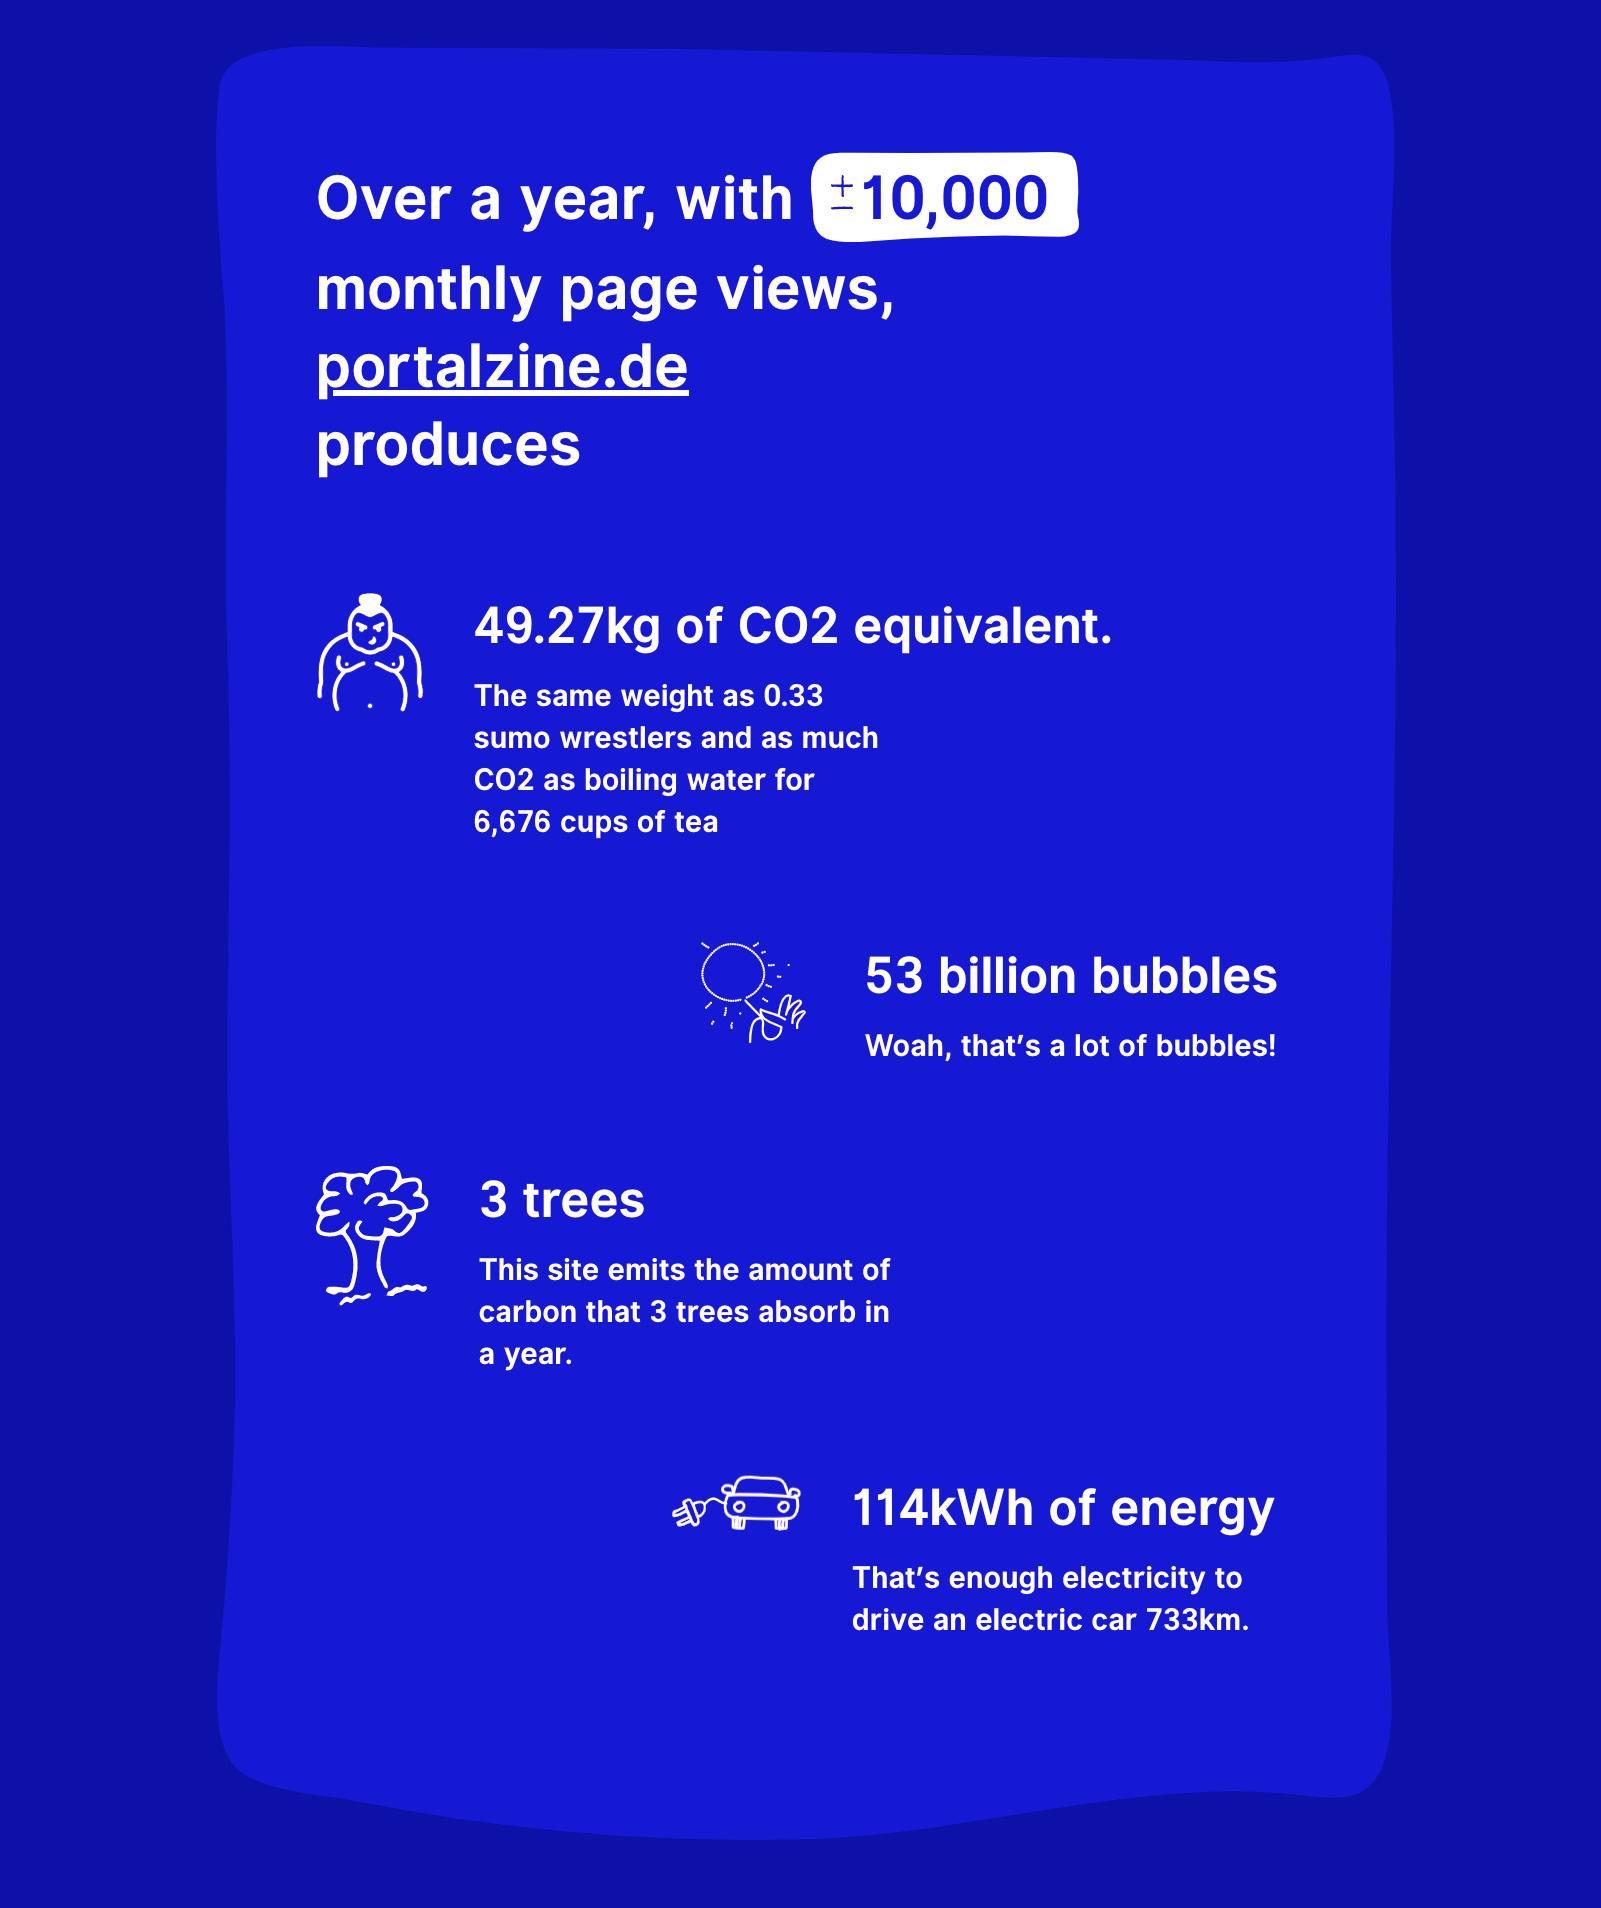 portalZINE NMN   Development meets Creativity   carbon footprint